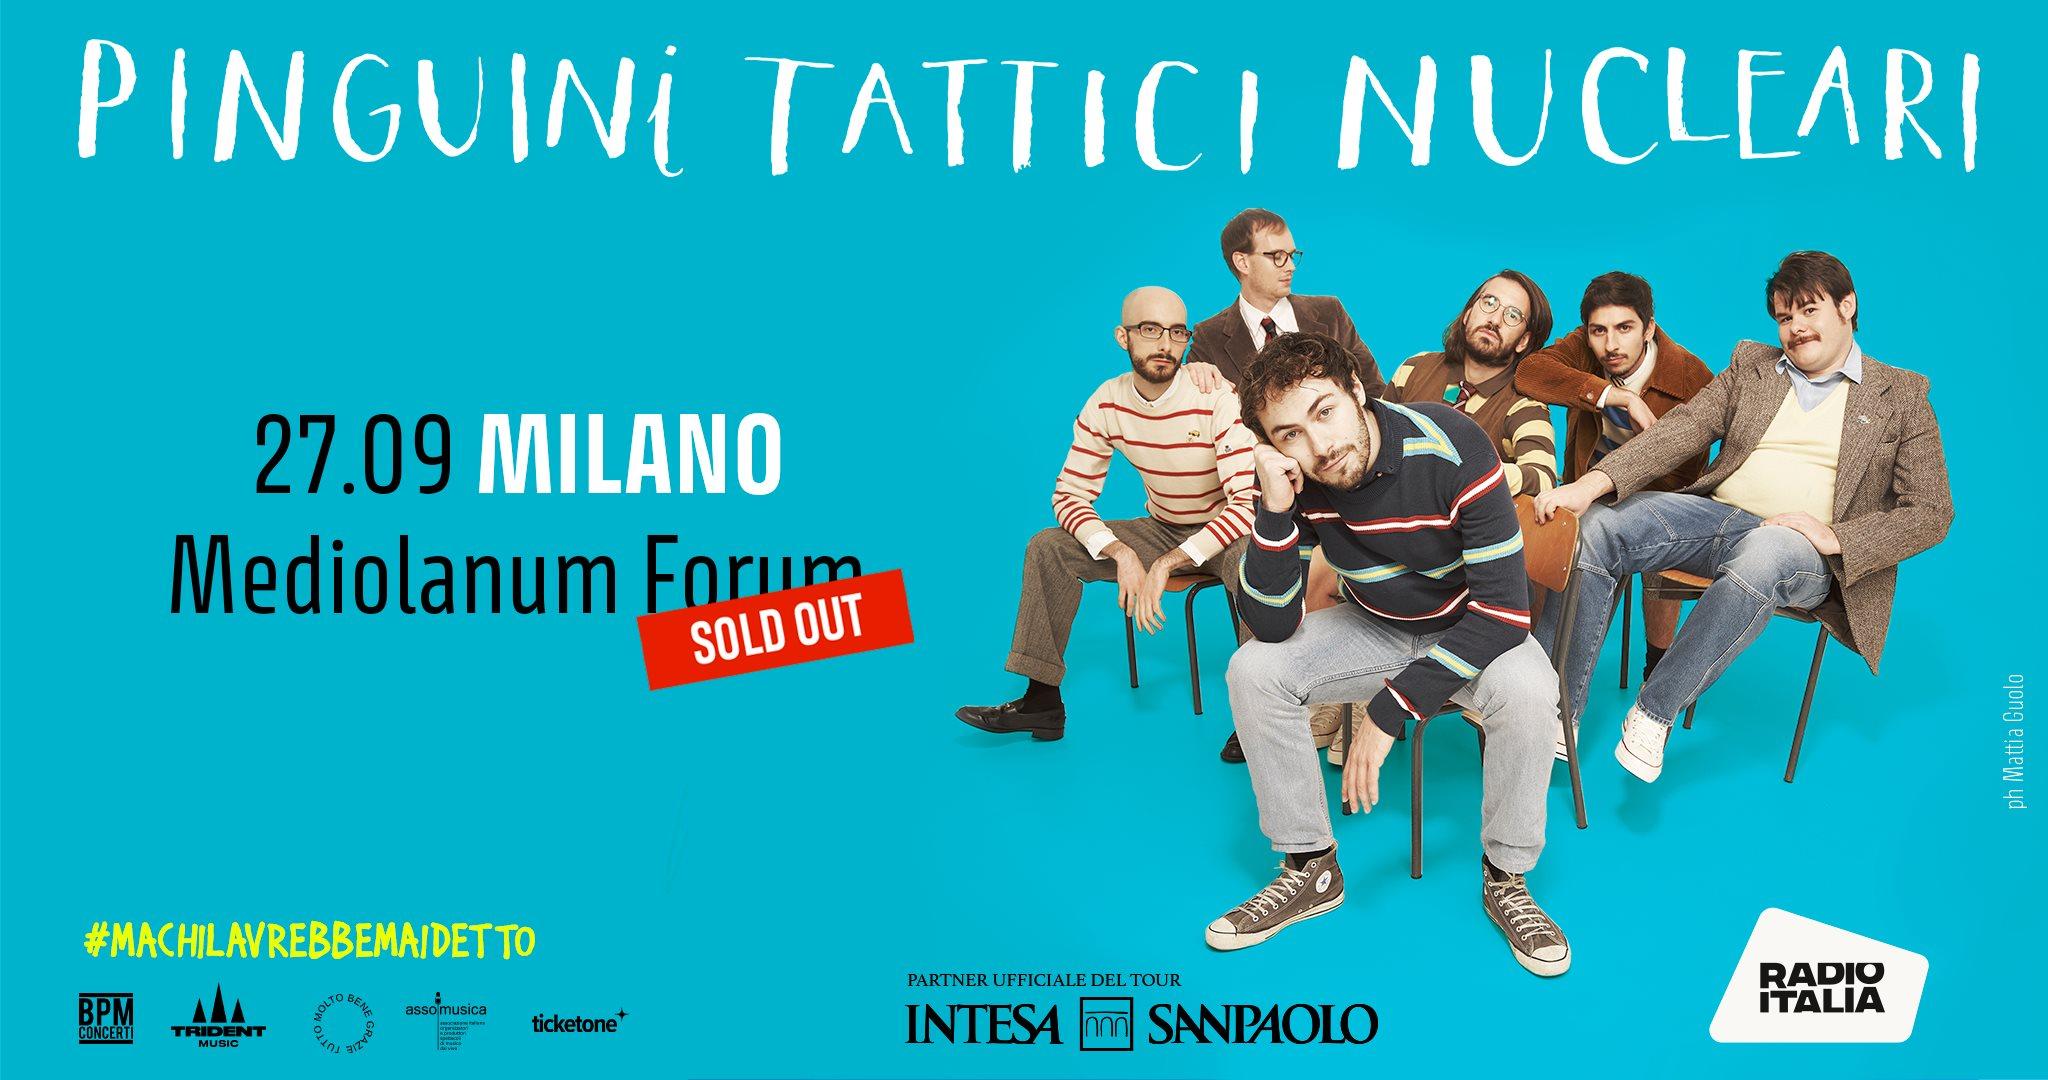 Pinguini Tattici Nucleari al Mediolanum Forum di Milano